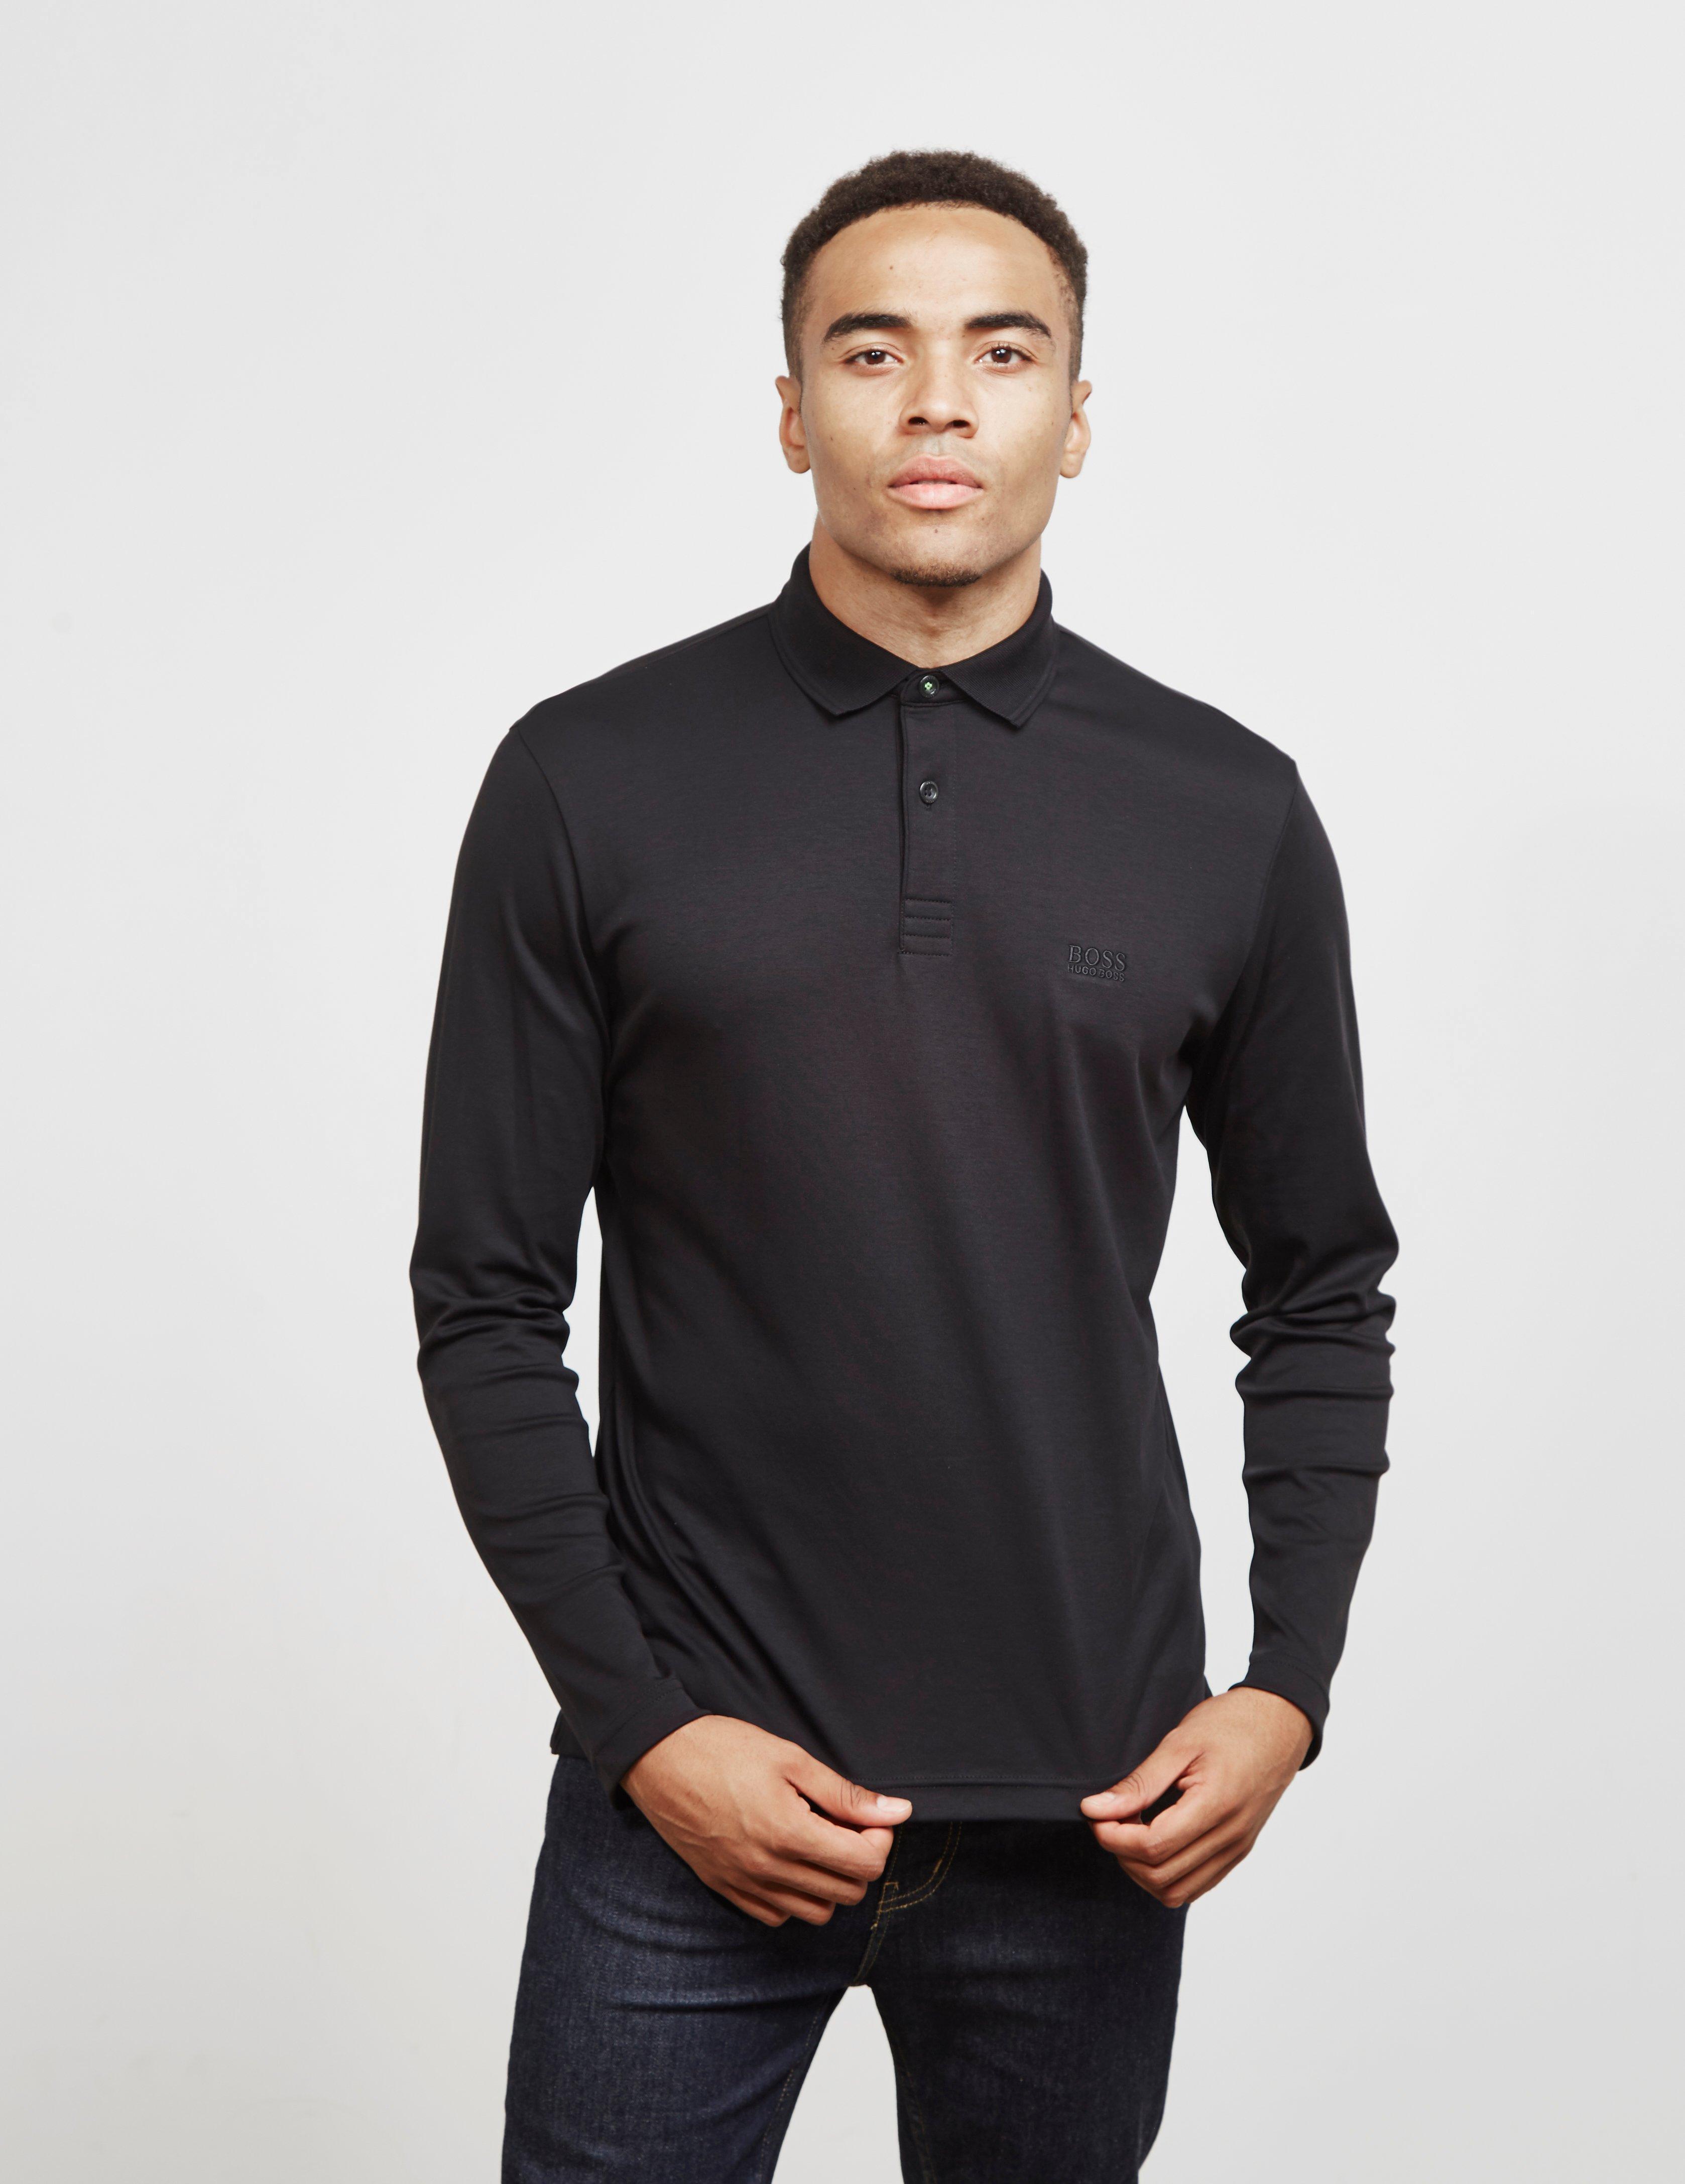 768a99ab BOSS Pirol Long Sleeve Polo Shirt Black in Black for Men - Lyst